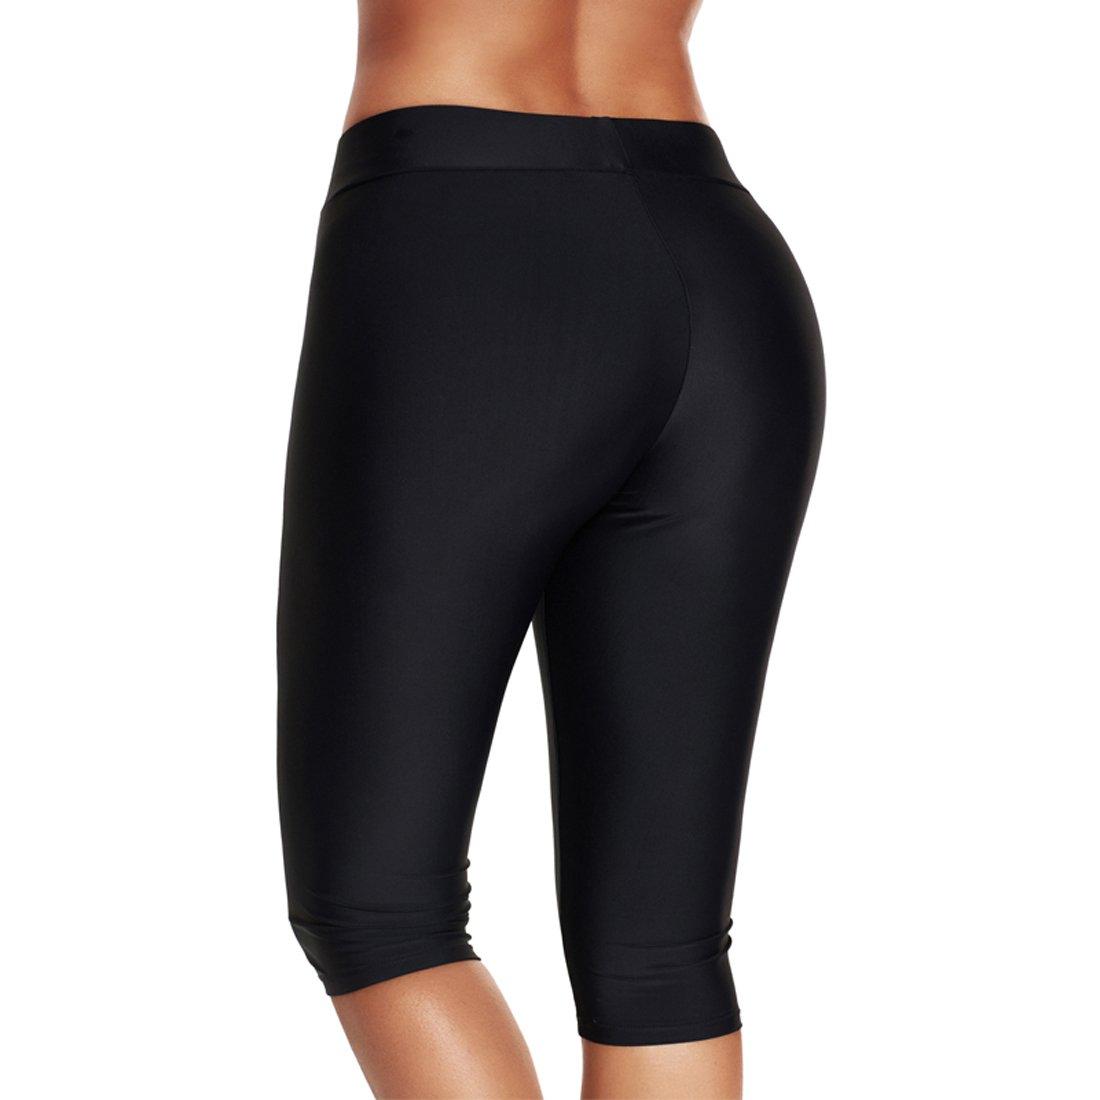 GOTIMAL Damen Badeshorts Leggings 3//4 Sporthose Badeanzug Schwimmshorts Badehose Wassersport Pants